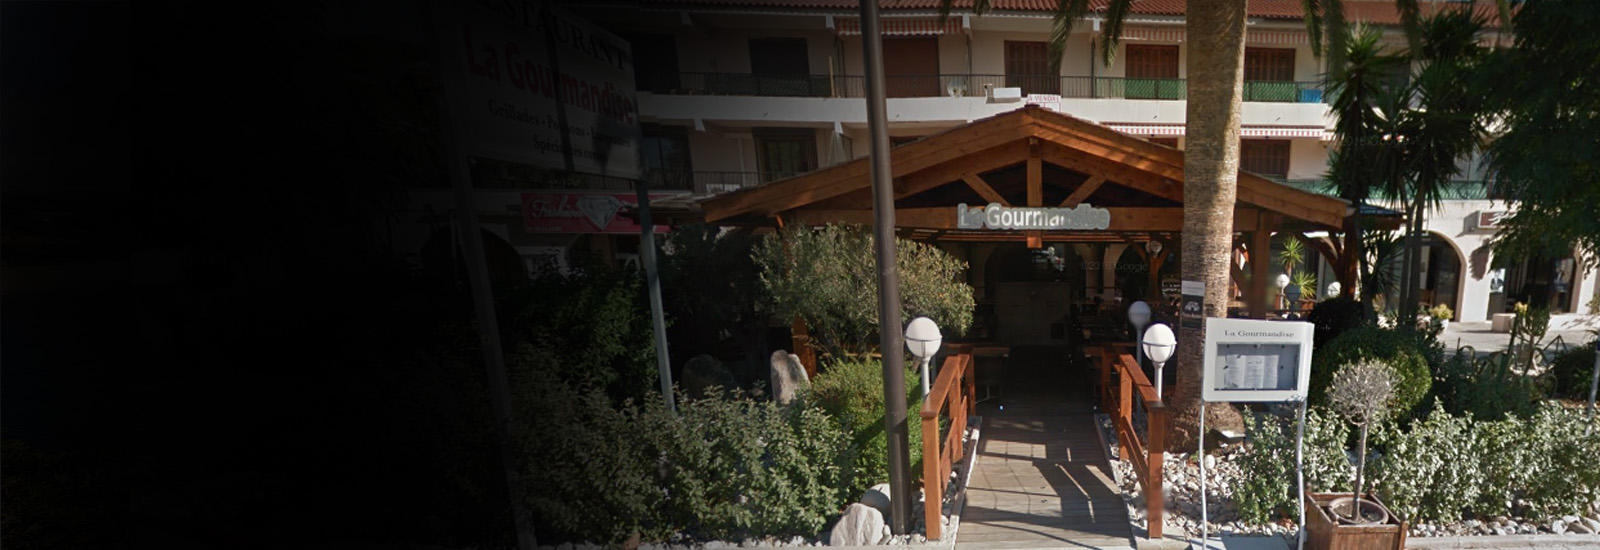 restaurantlagourmandise-20111 CASAGLIONE